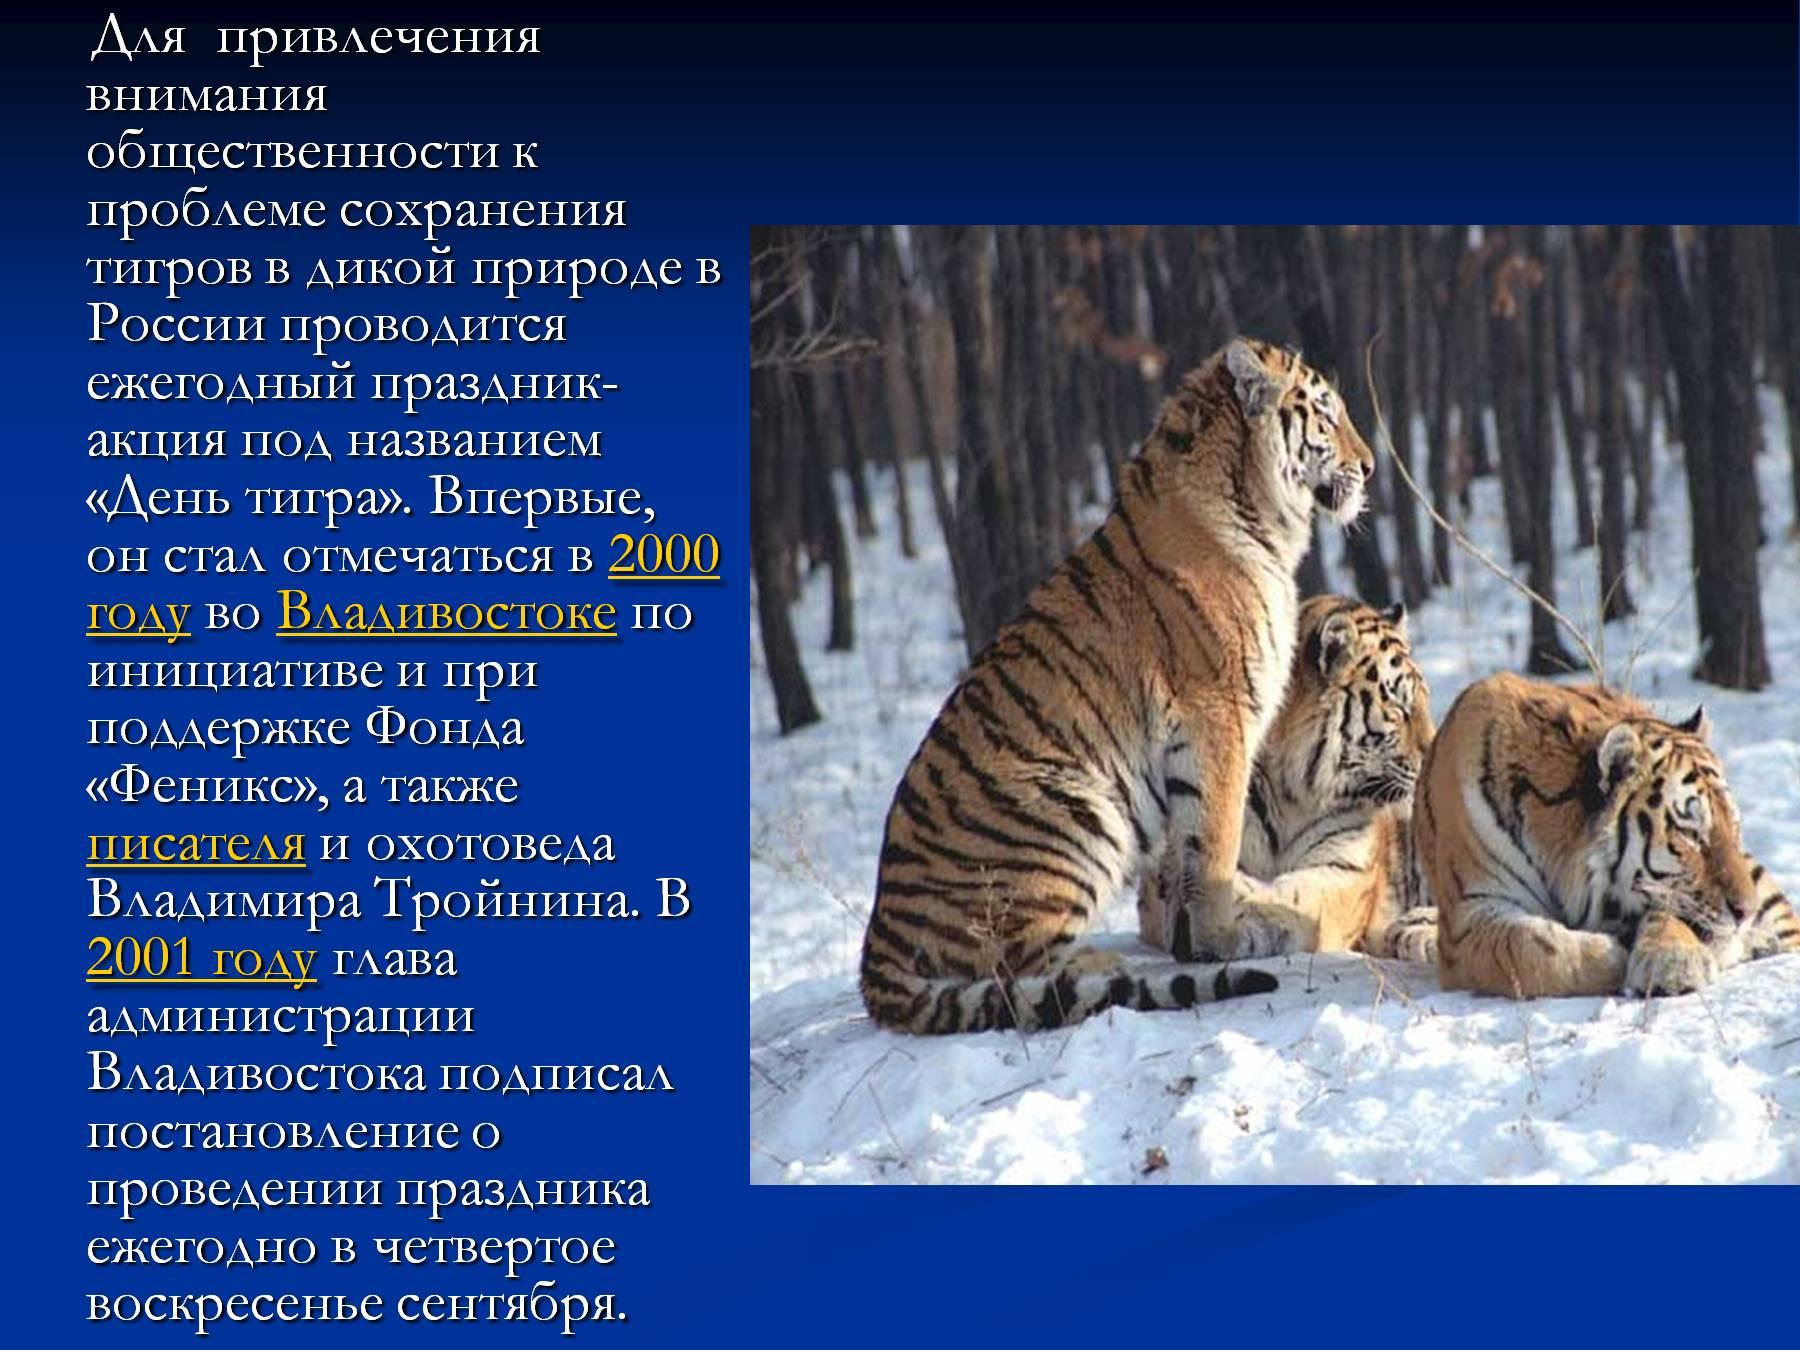 Картинка в презентацию амурский тигр